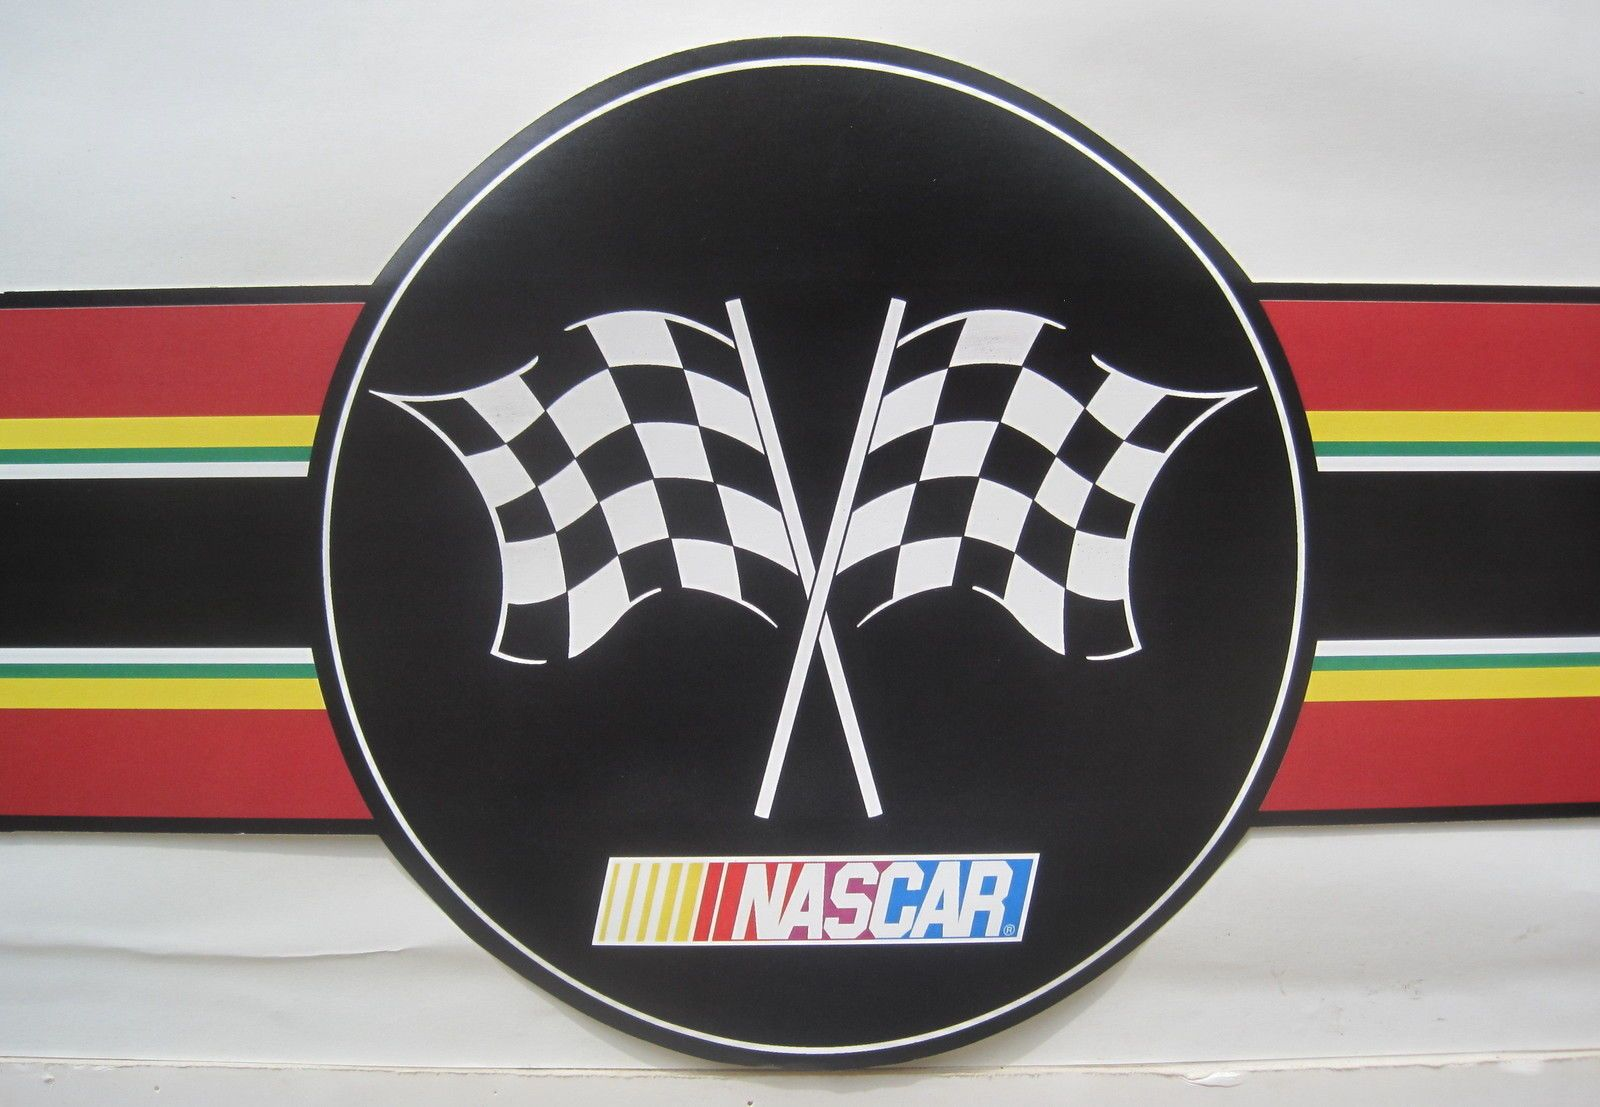 Details about NASCAR RACING LOGO STOCK CAR Wallpaper